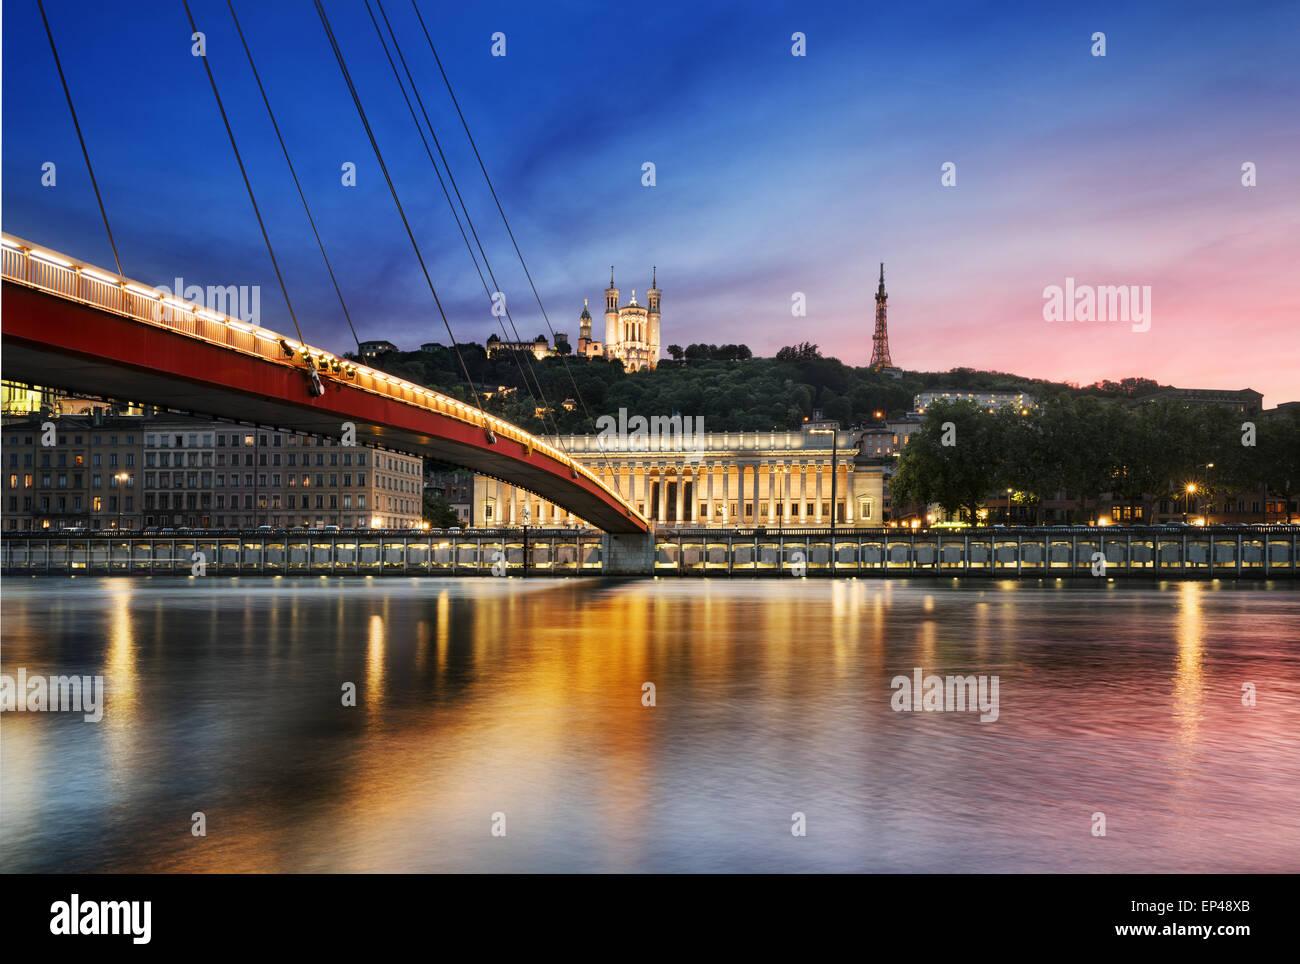 View of Saone river at sunset,Lyon, France. - Stock Image